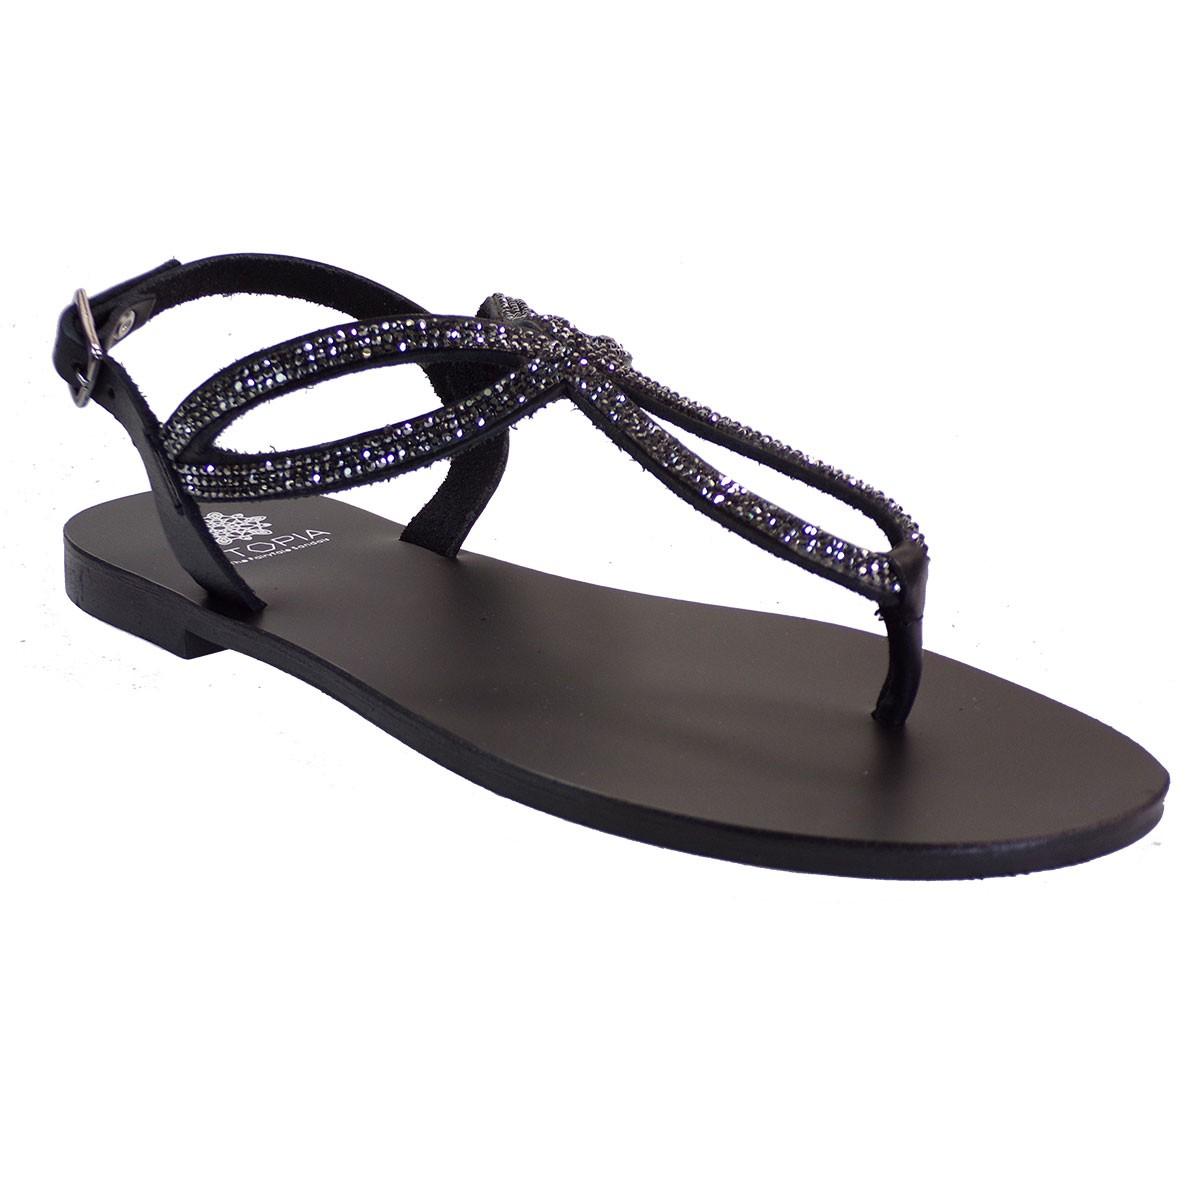 UTOPIA Γυναικεία Παπούτσια Πέδιλα U1-004 Μαύρο Δέρμα